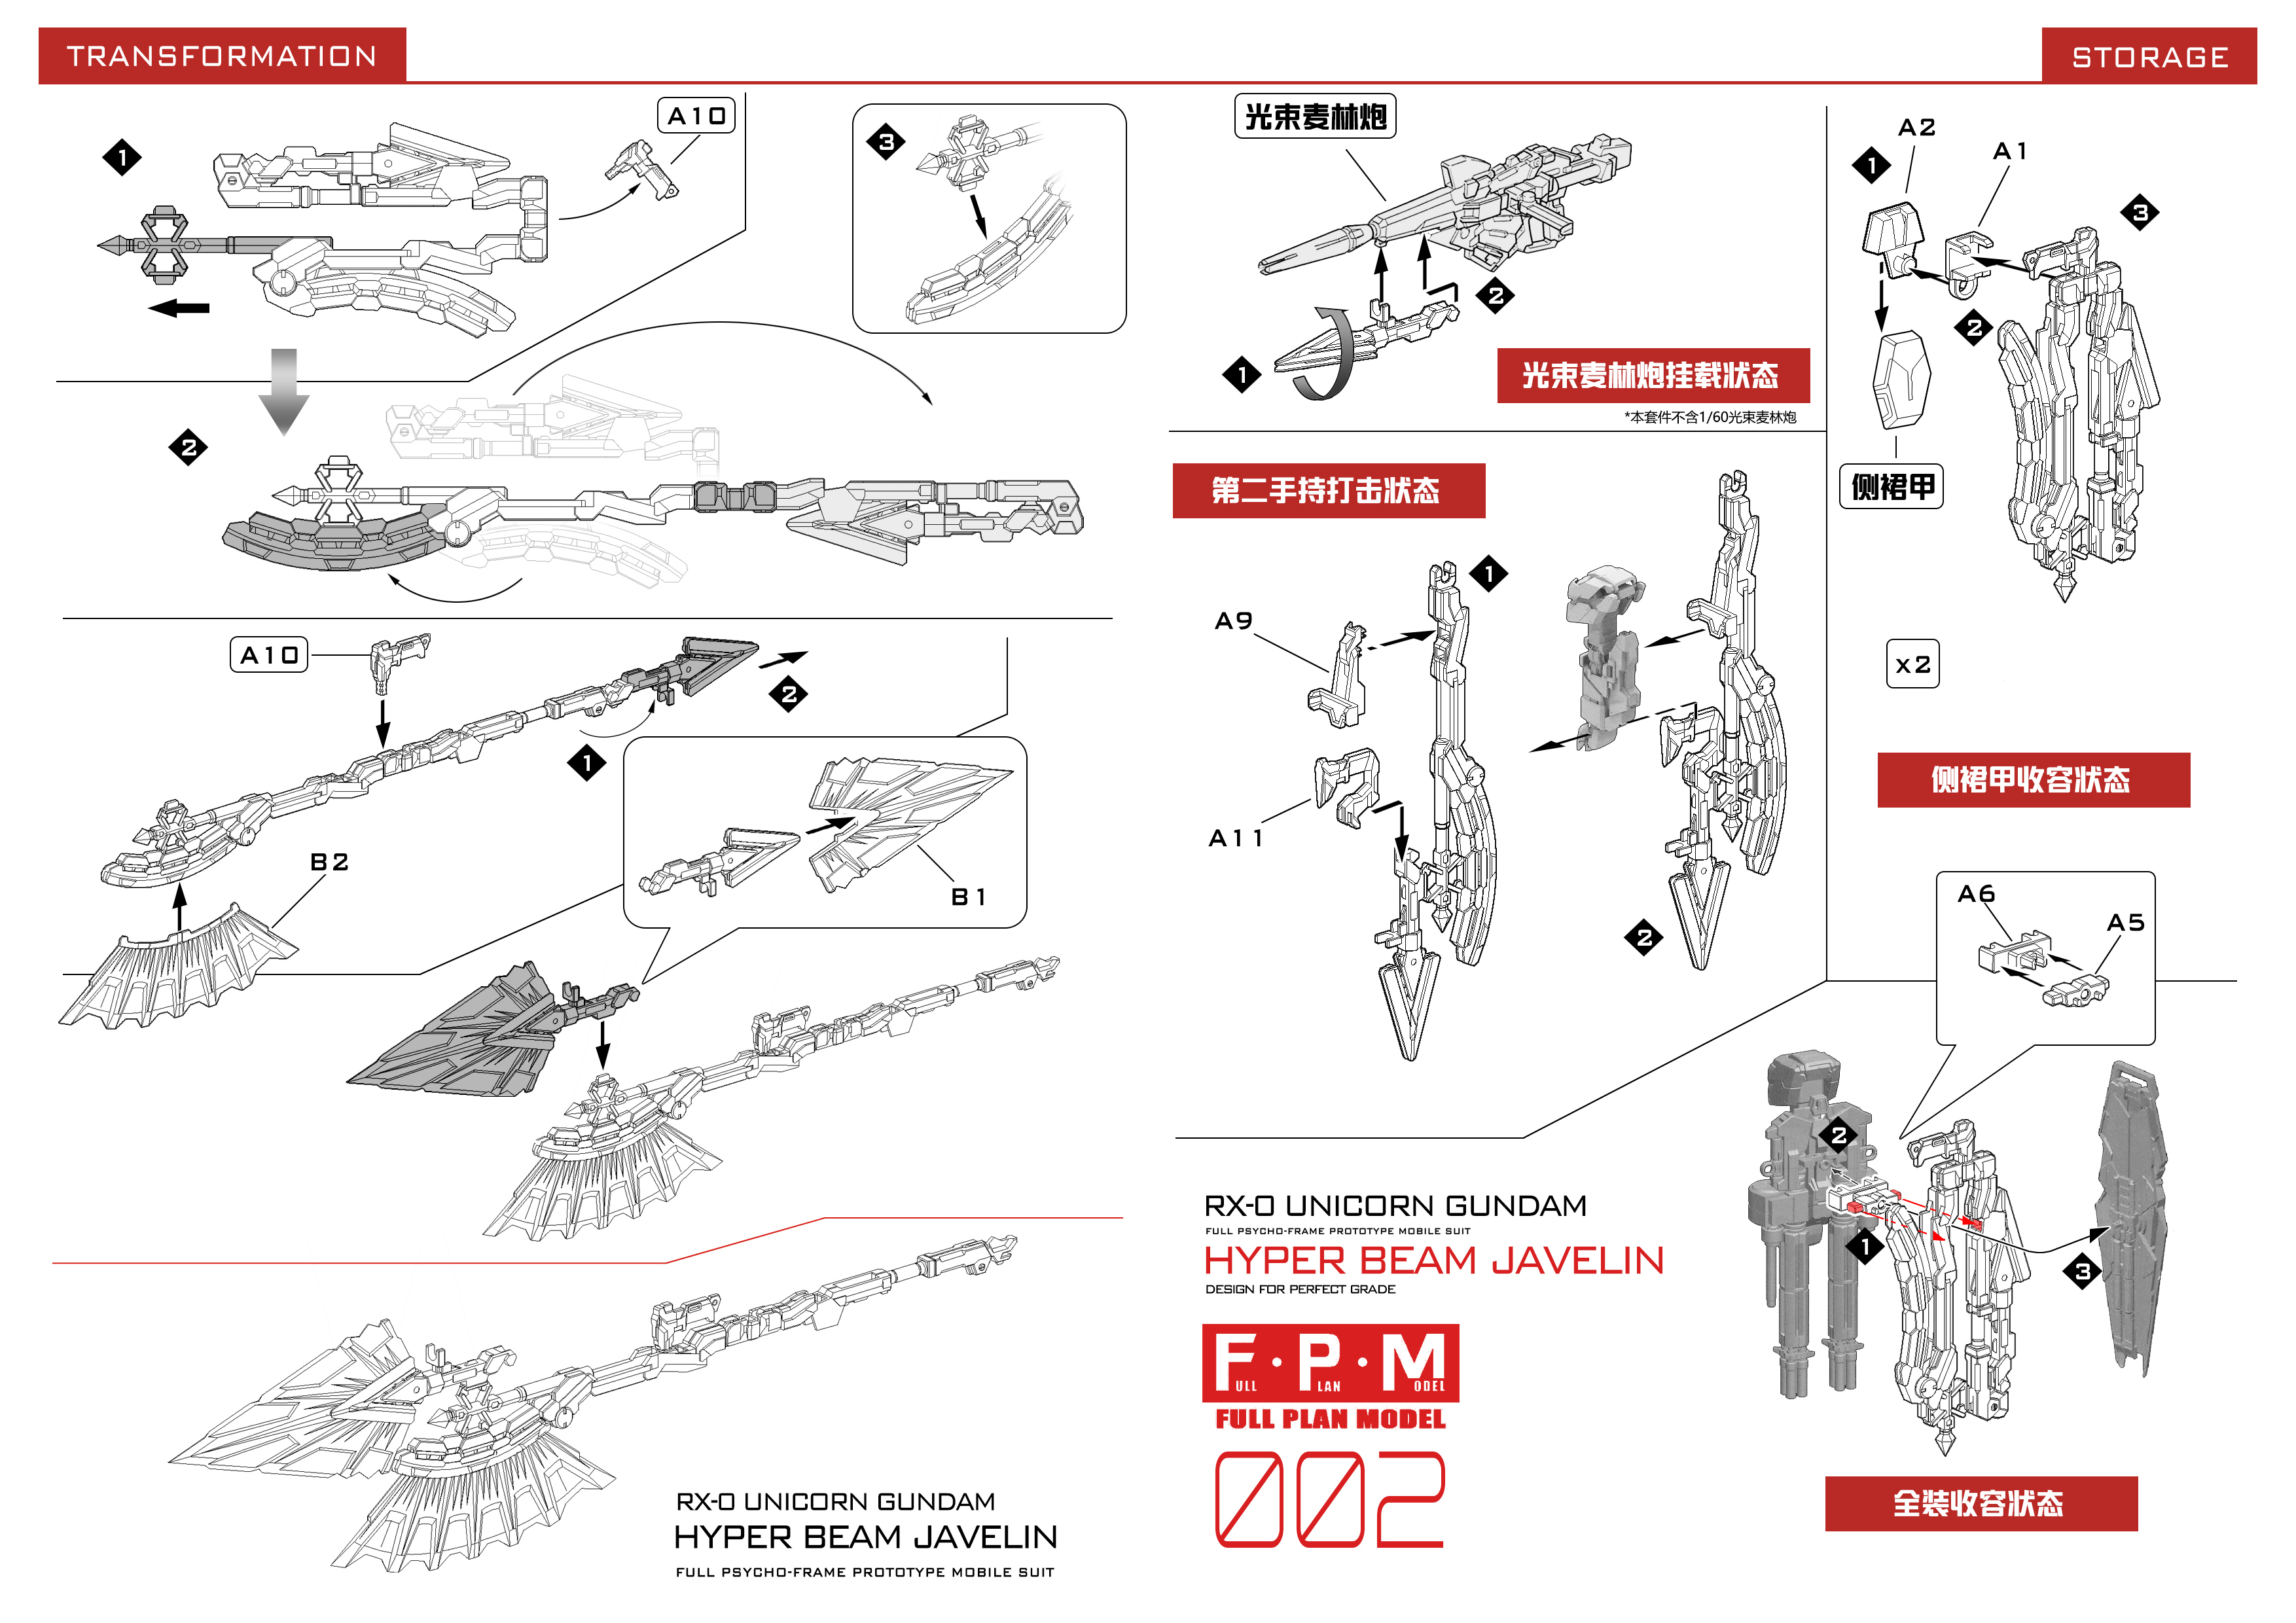 S135-136-bainshi-unicon-010.jpg